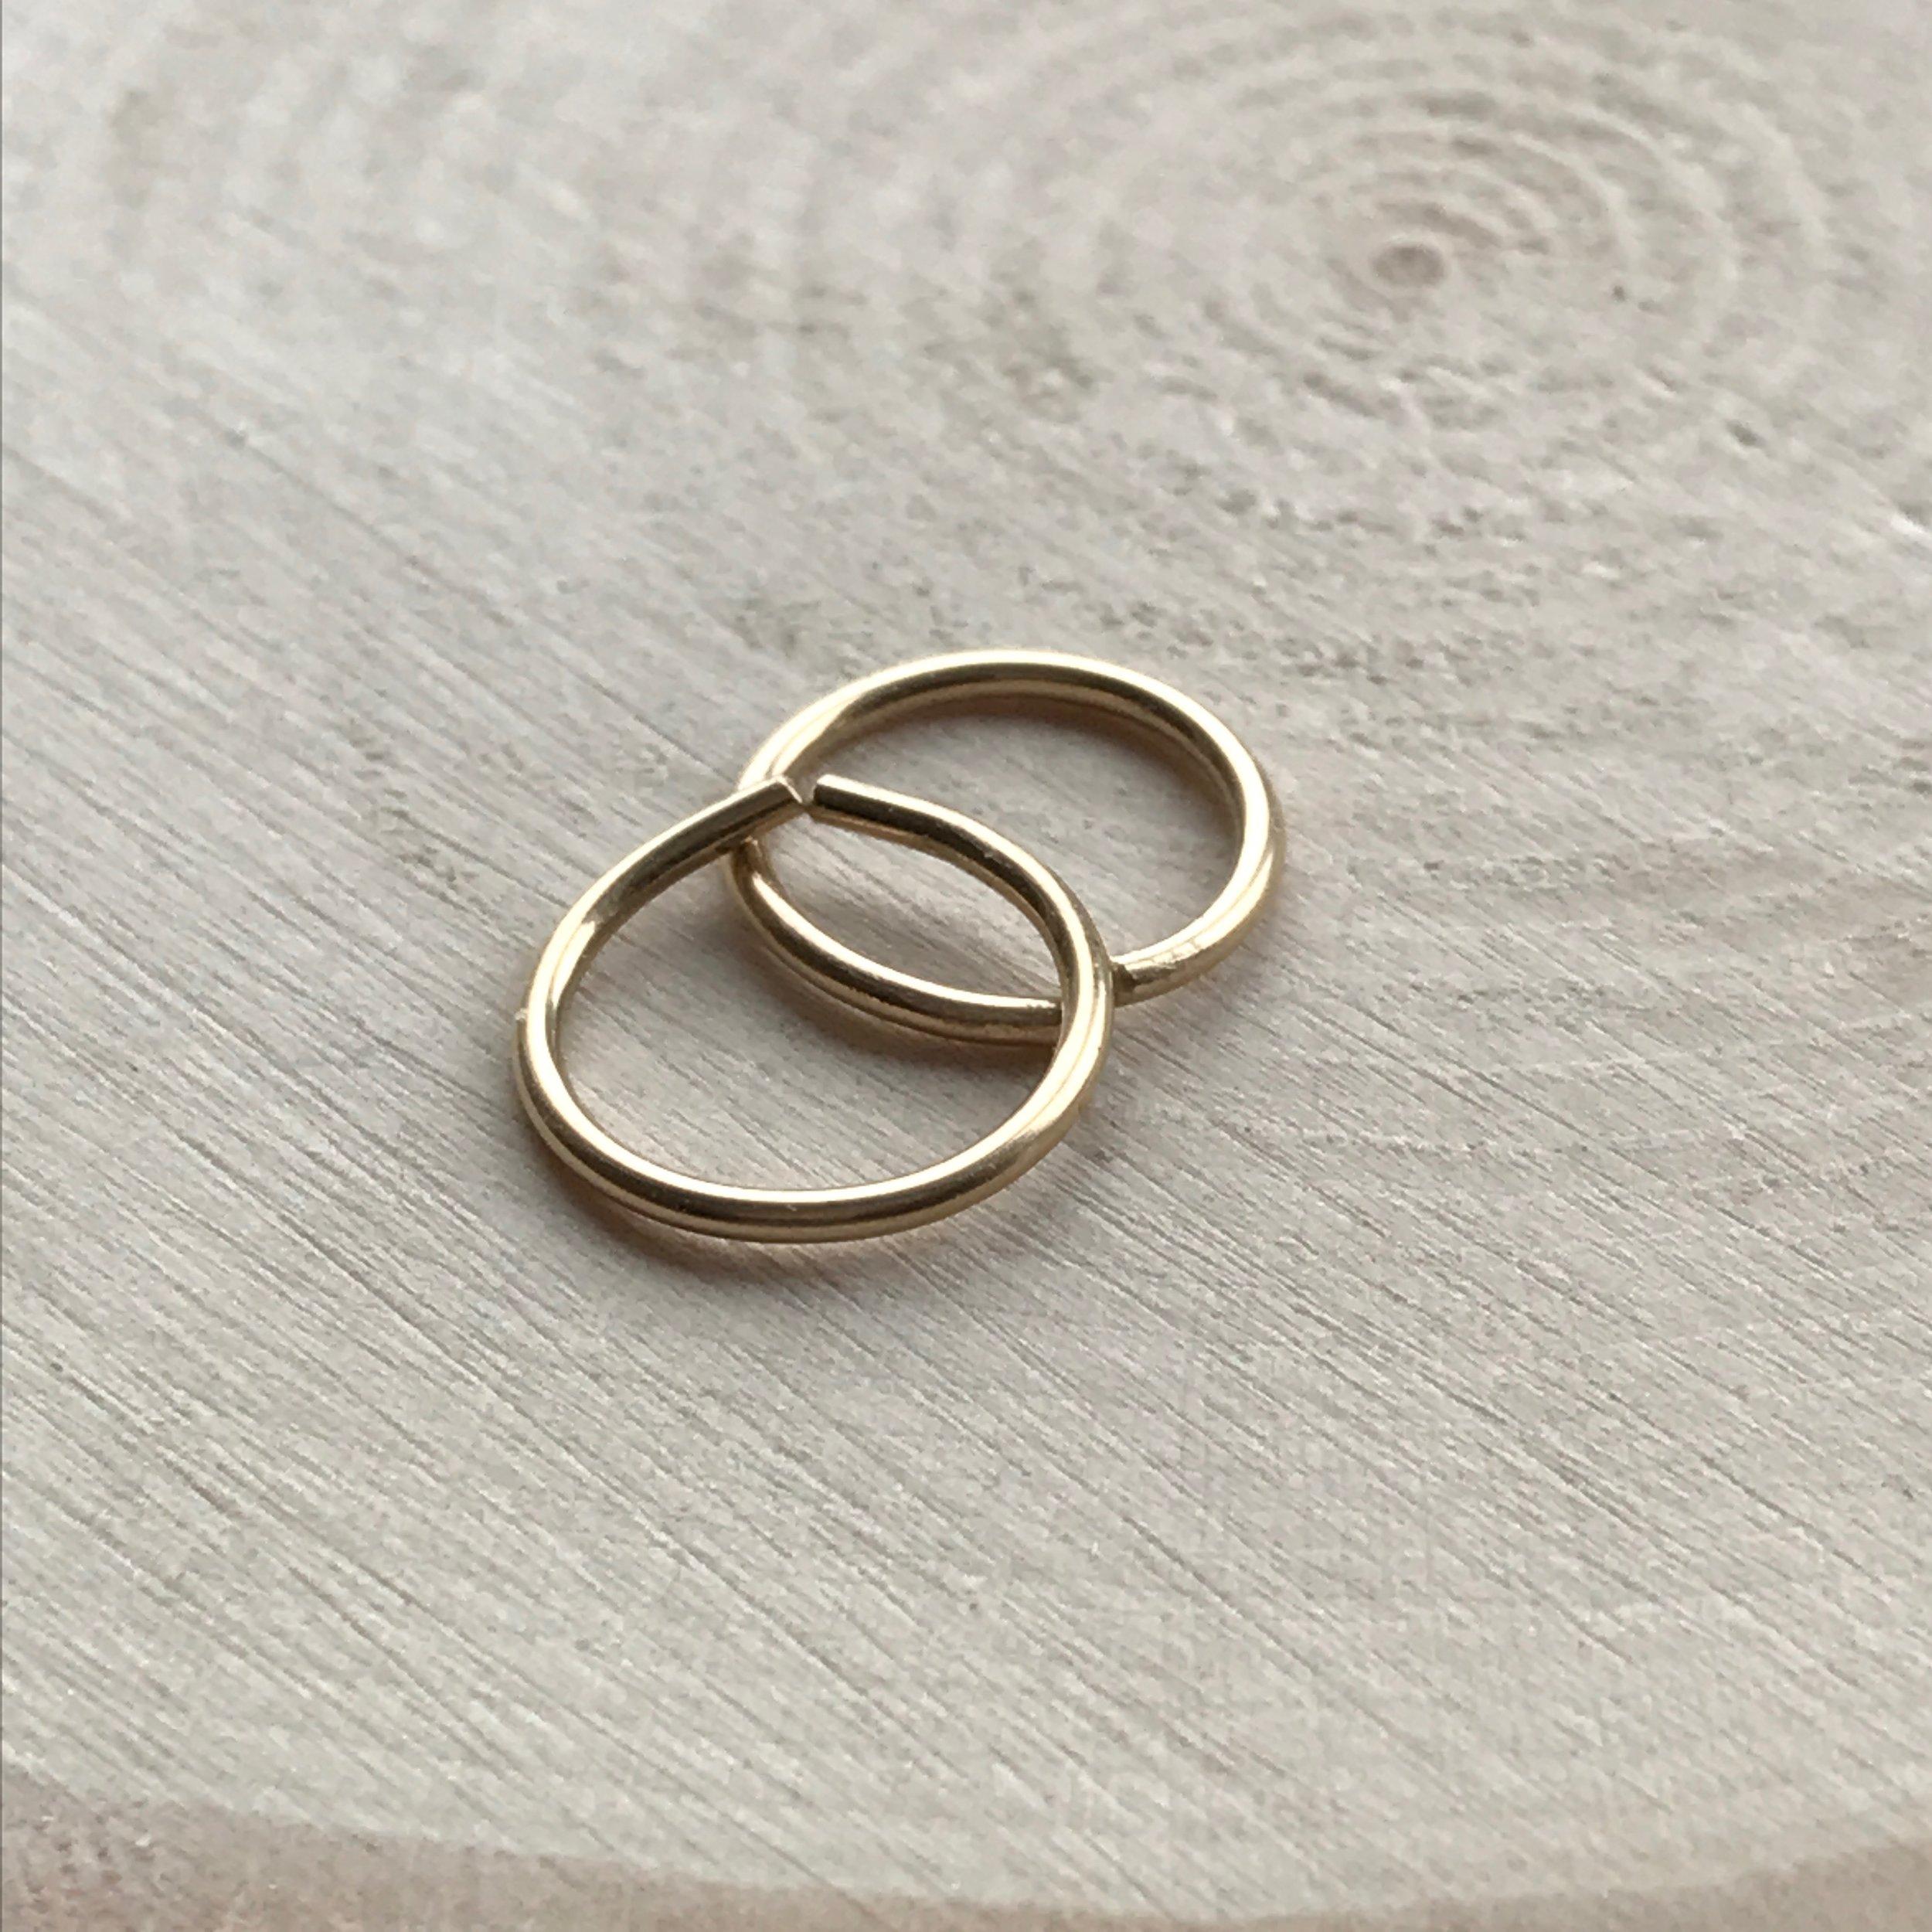 14k Gold fill, 10mm diameter, 18ga handmade in UK